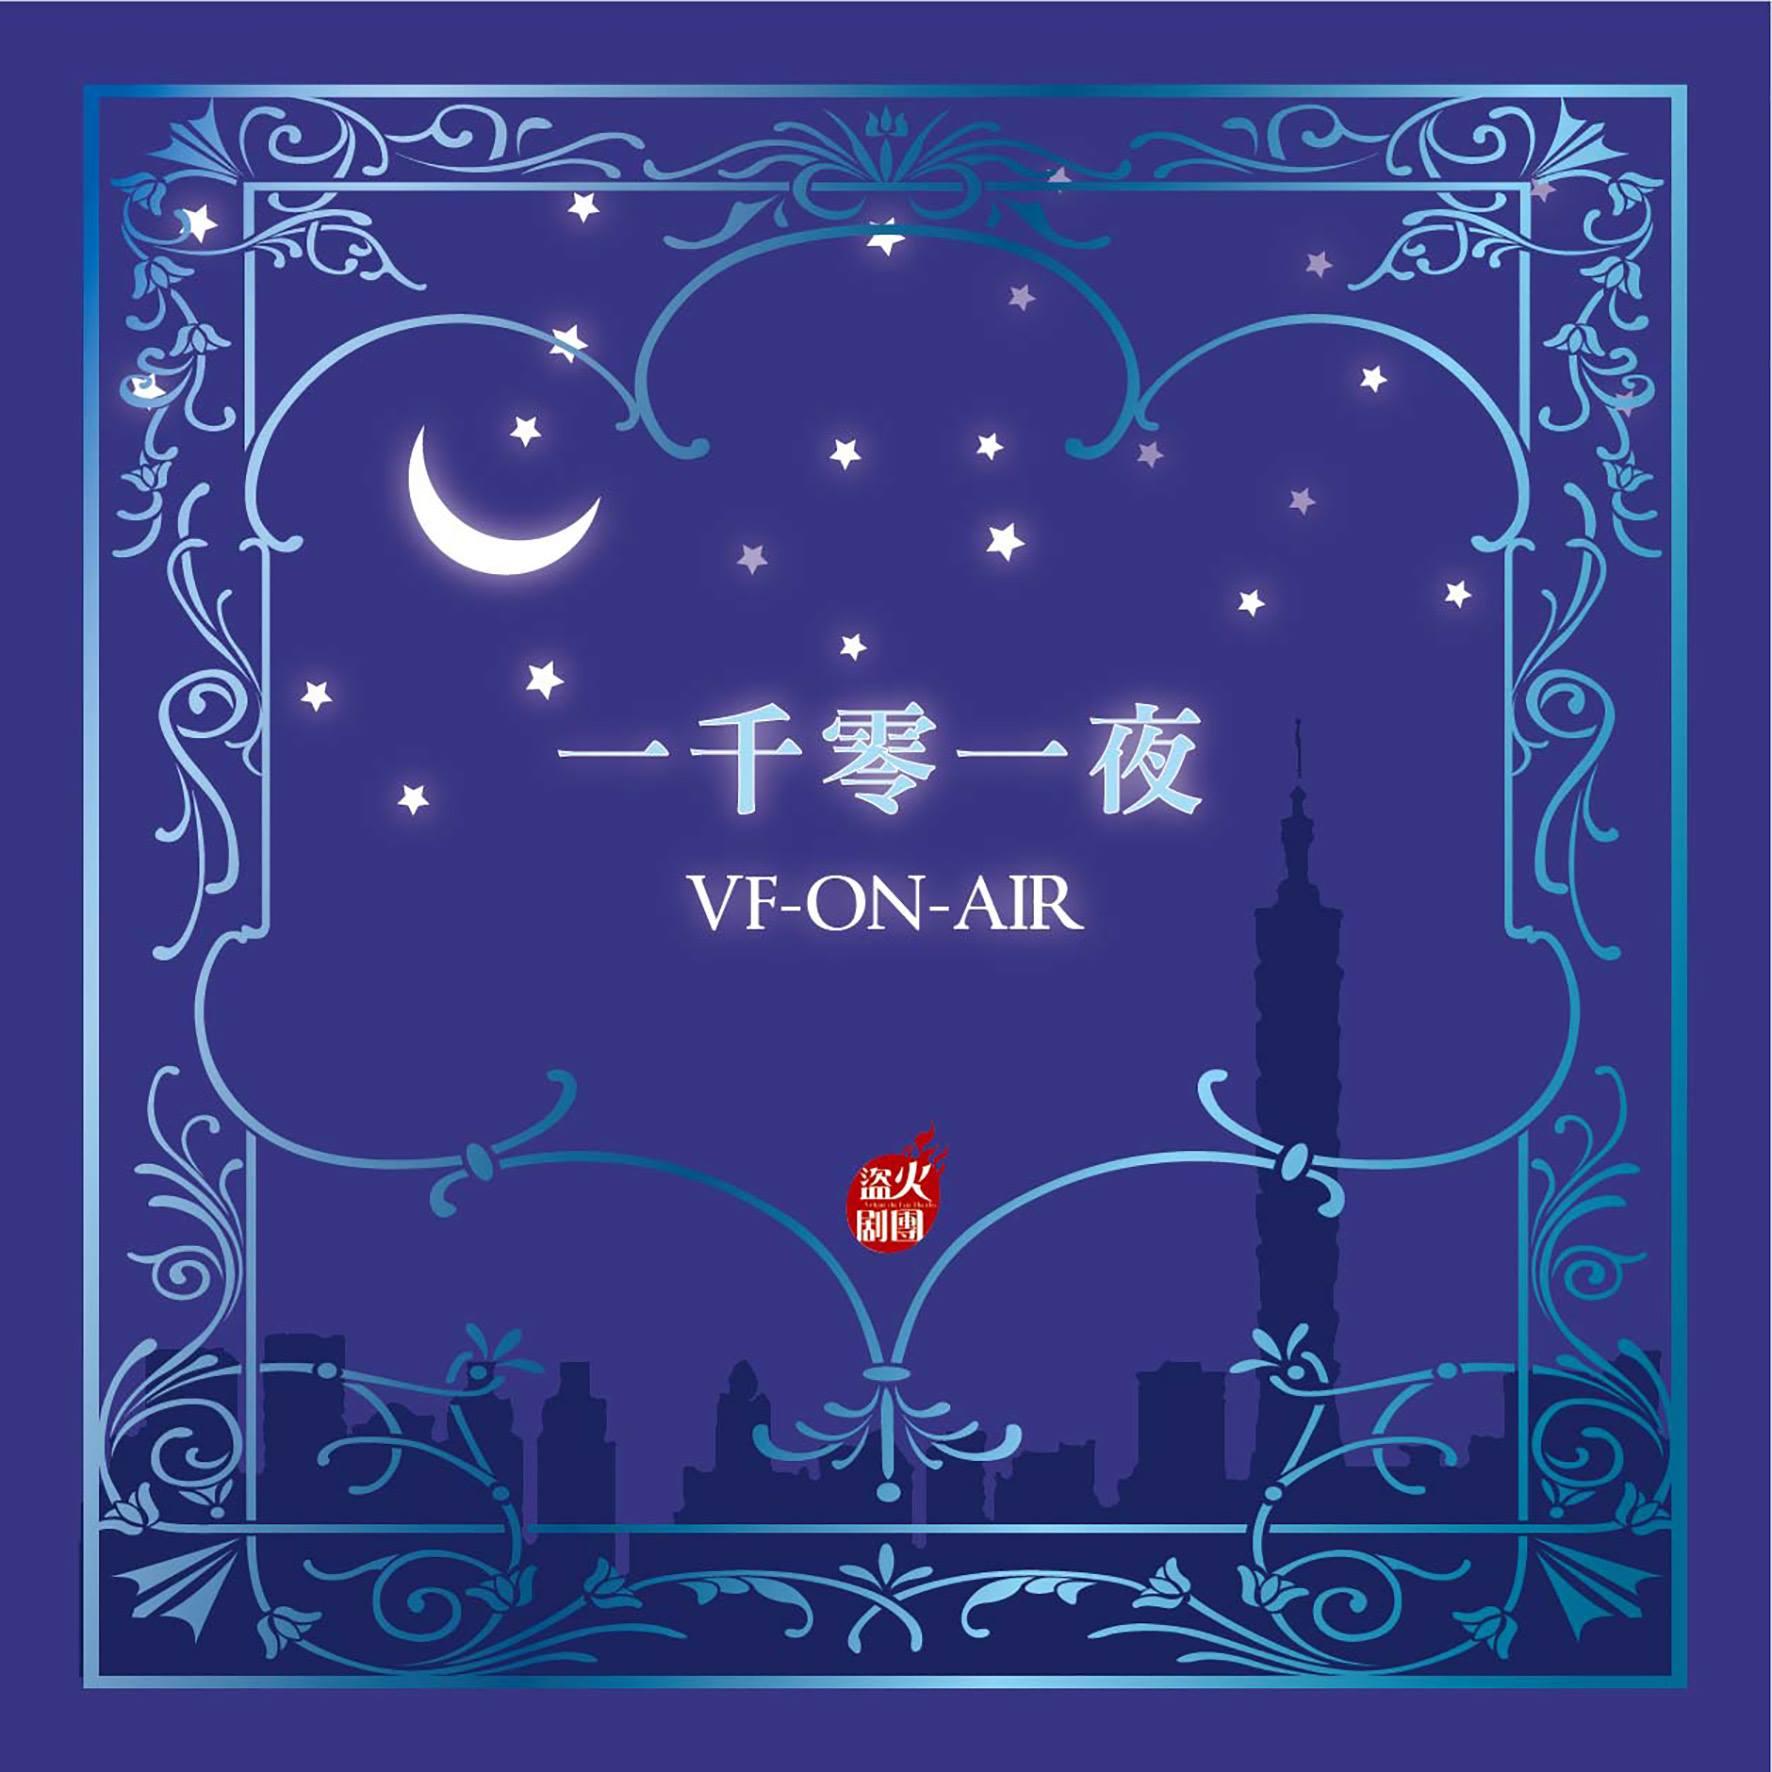 一千零一夜VF-ON-AIR